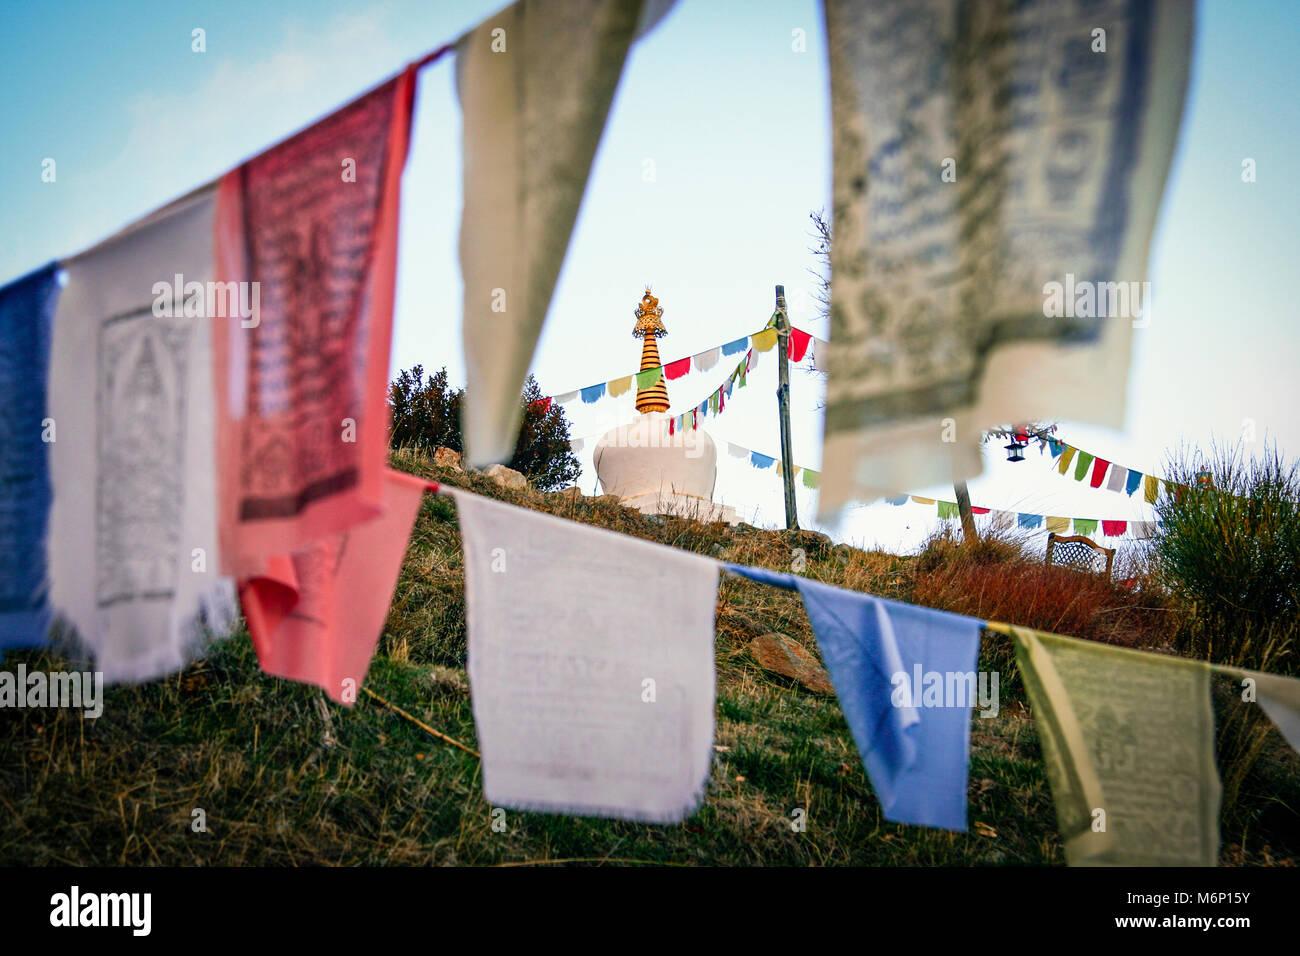 Las Alpujarras, Granada province, Andalusia, Spain : Tibetan stupa and prayer flags at O Sel Ling Buddhist retreat - Stock Image